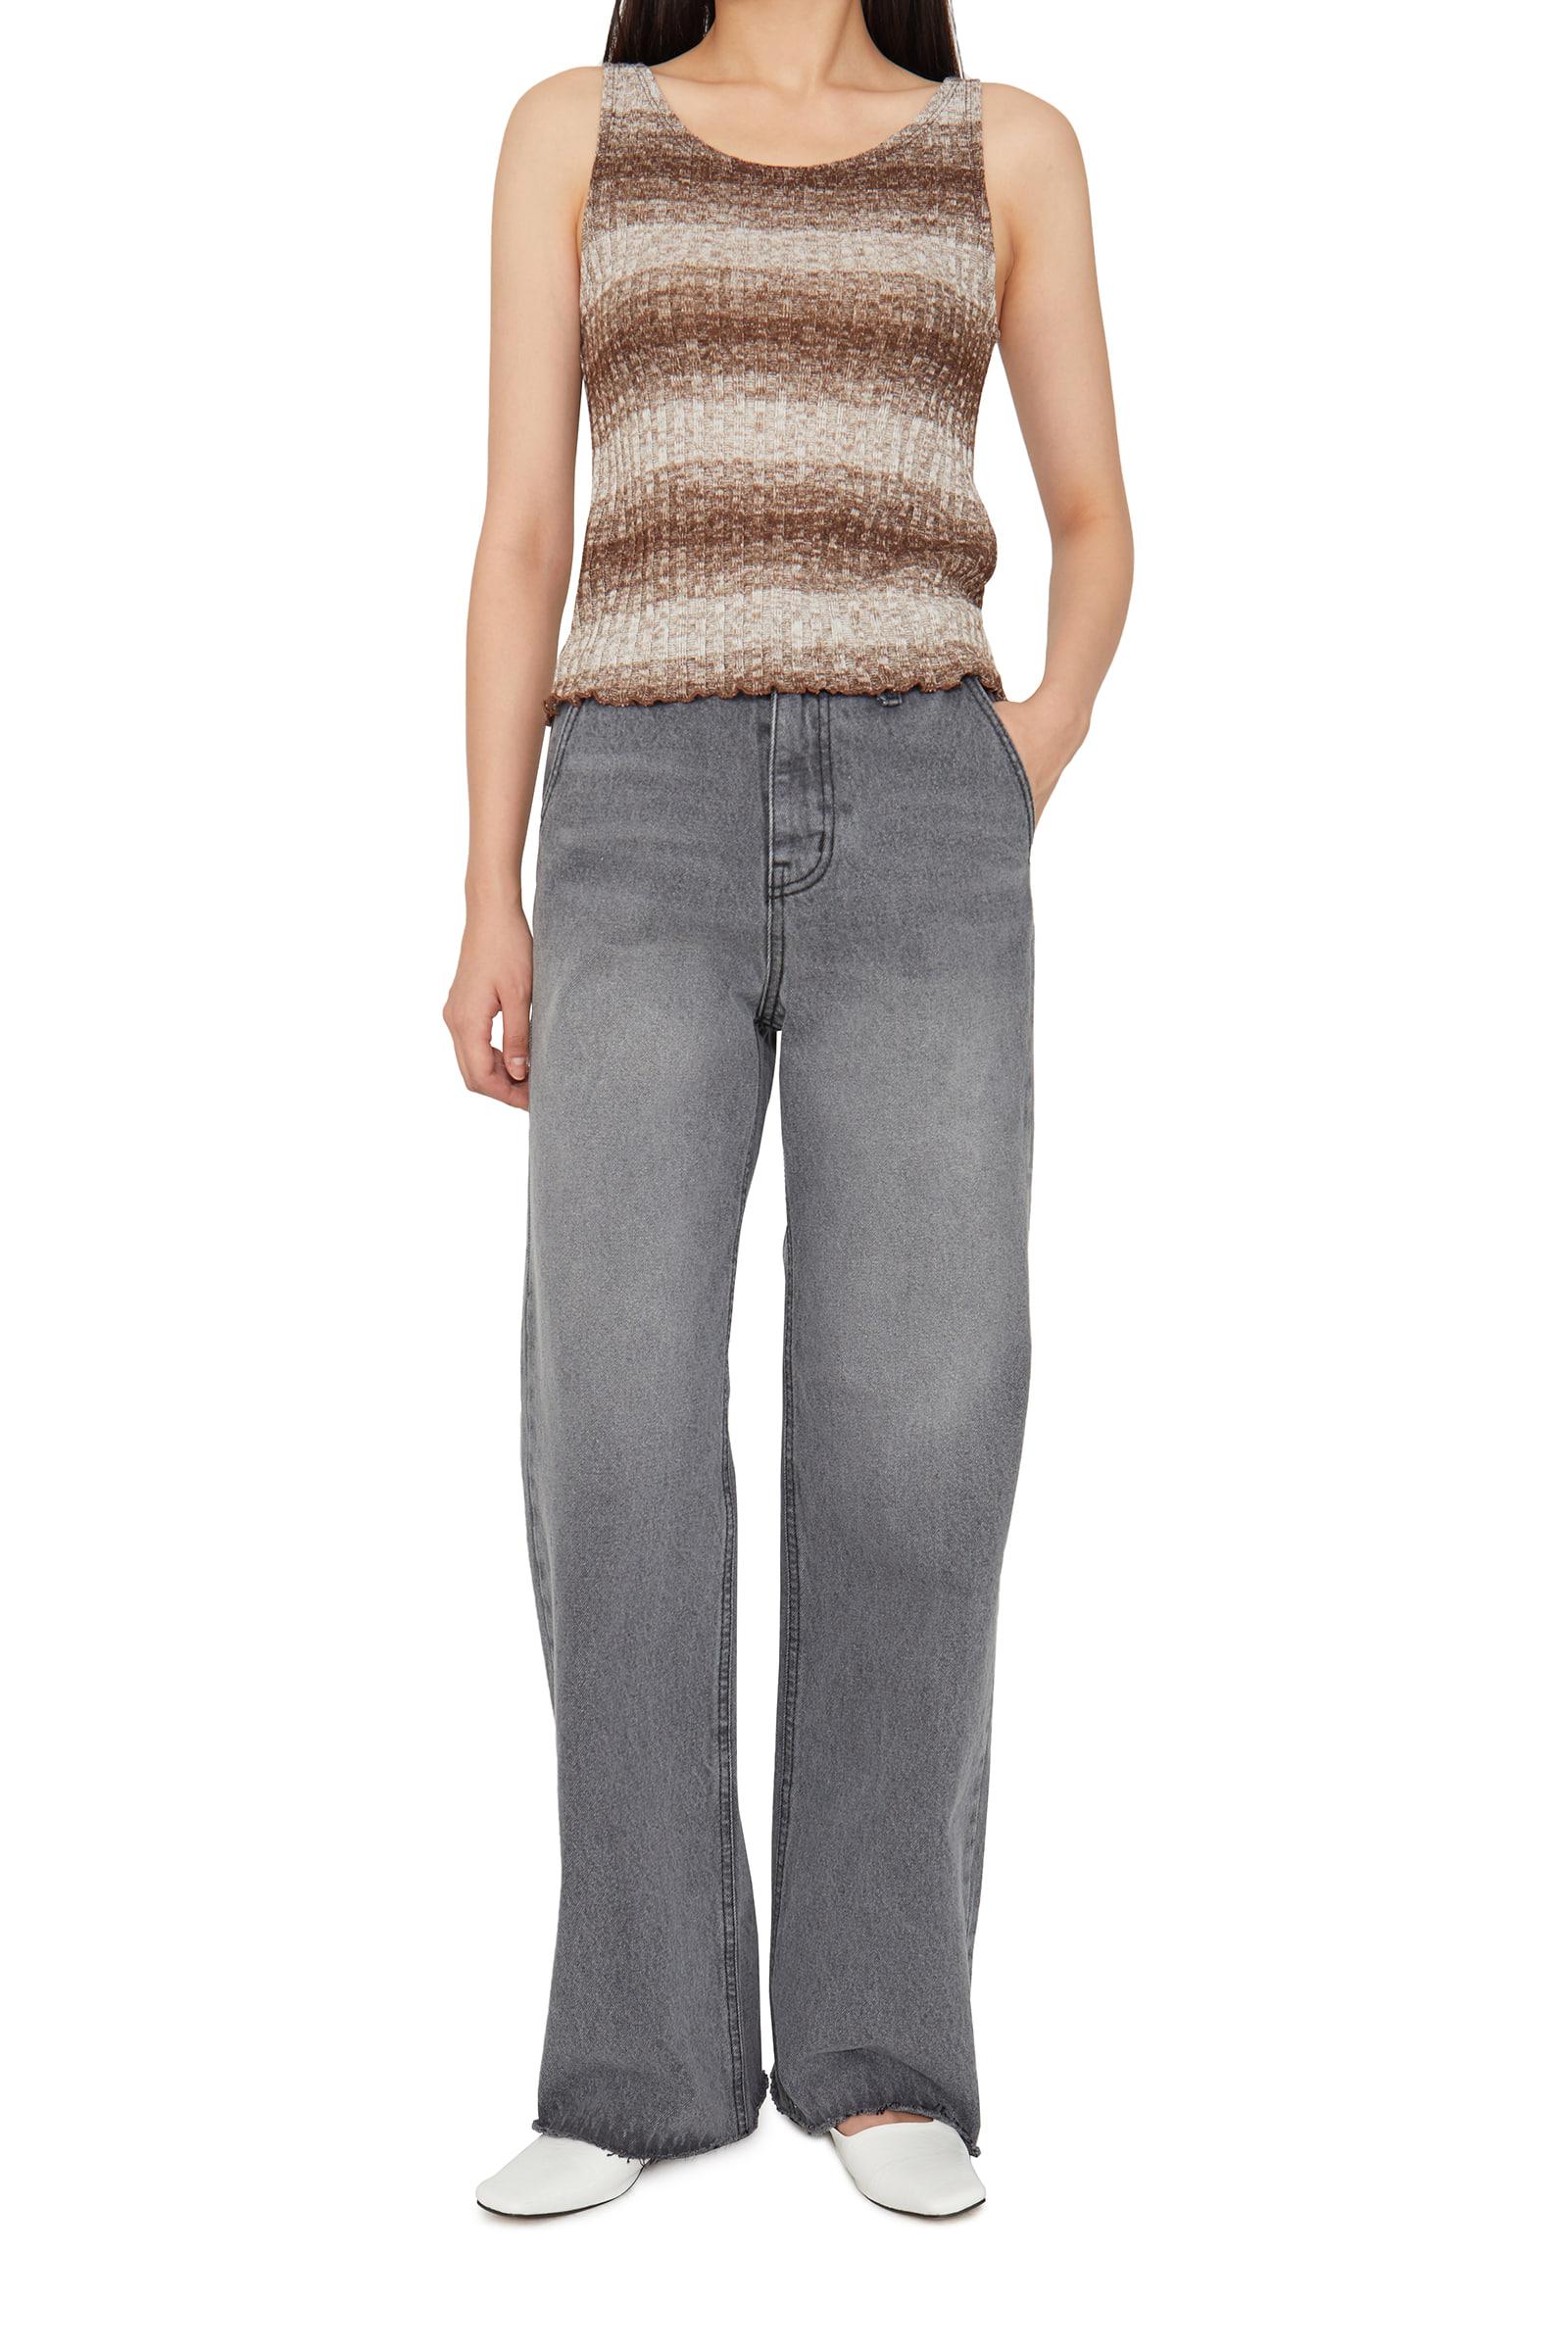 Manon retro straight jeans